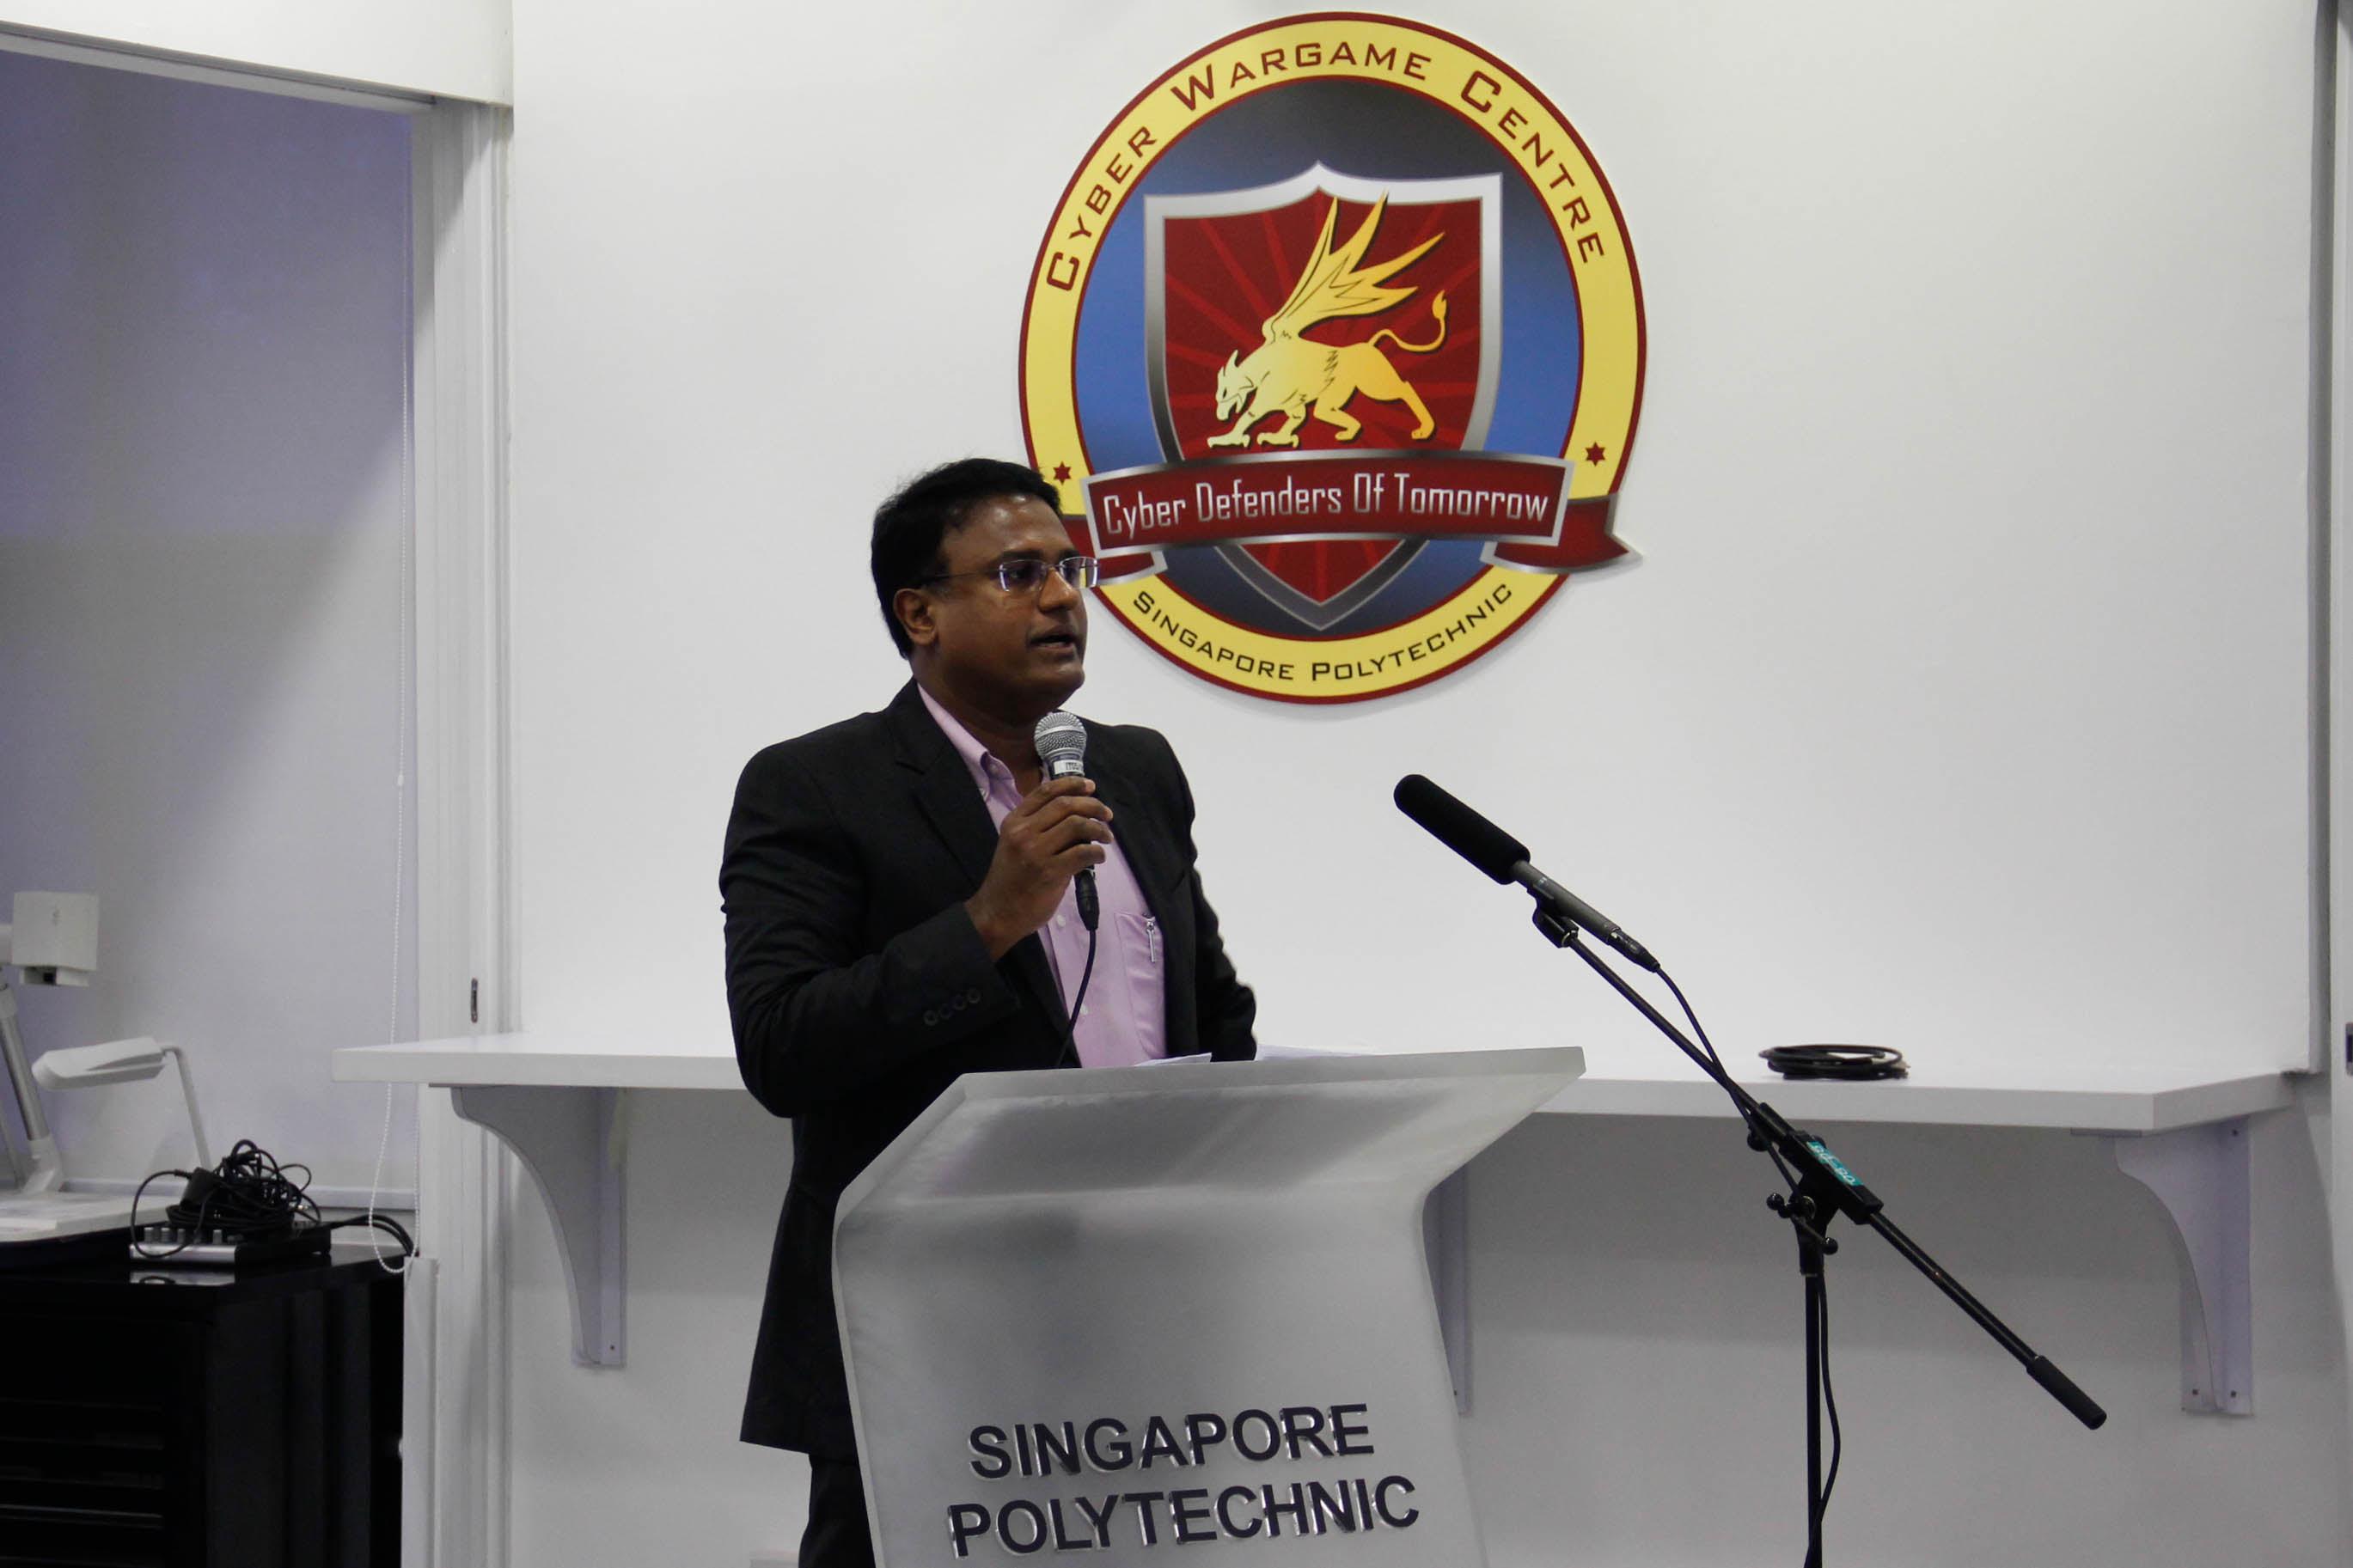 Mr Jamal Sheik giving an introductory presentation on ISACA